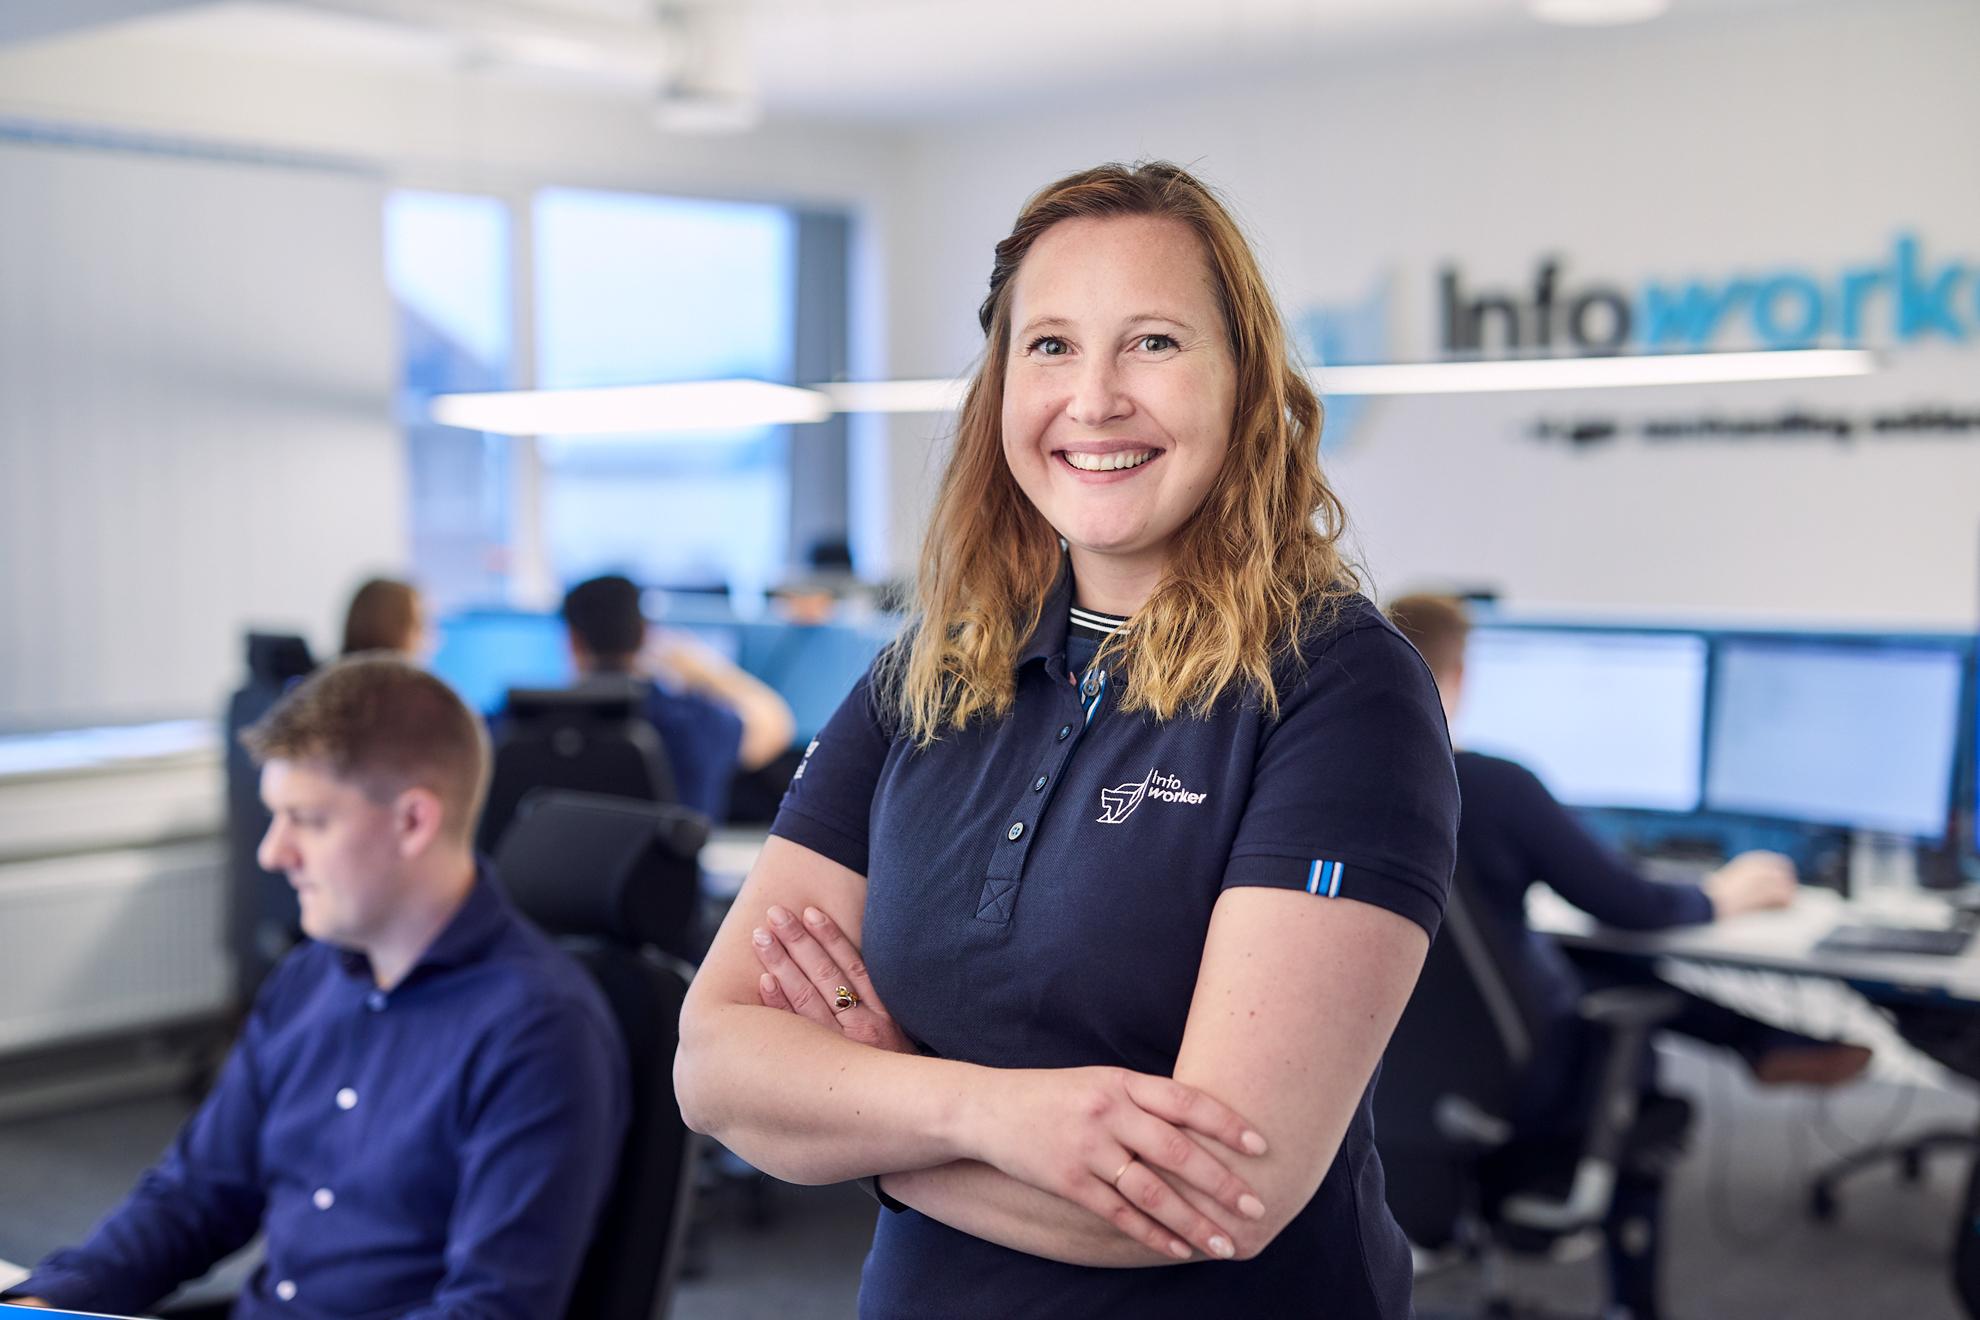 Karriere i Infoworker - med fokus på kompetanseheving